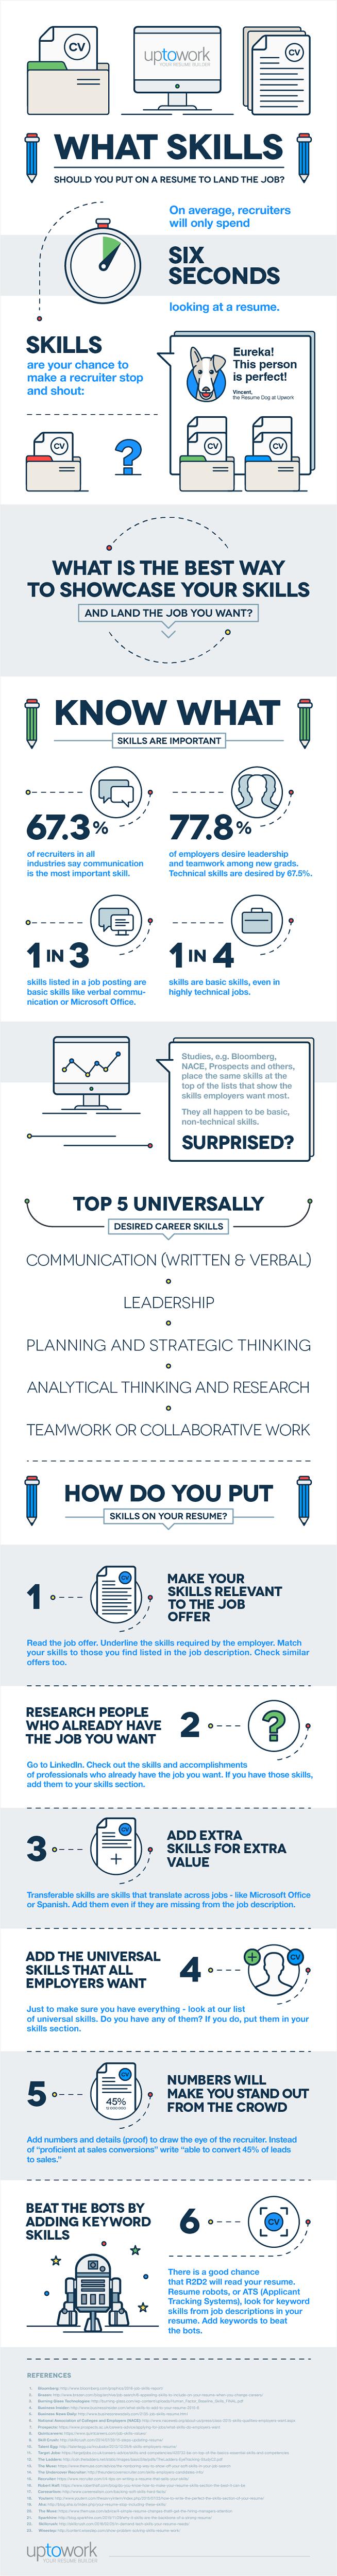 Get recruiters\' attention in 6 easy steps | Busco trabajo, Boj y ...